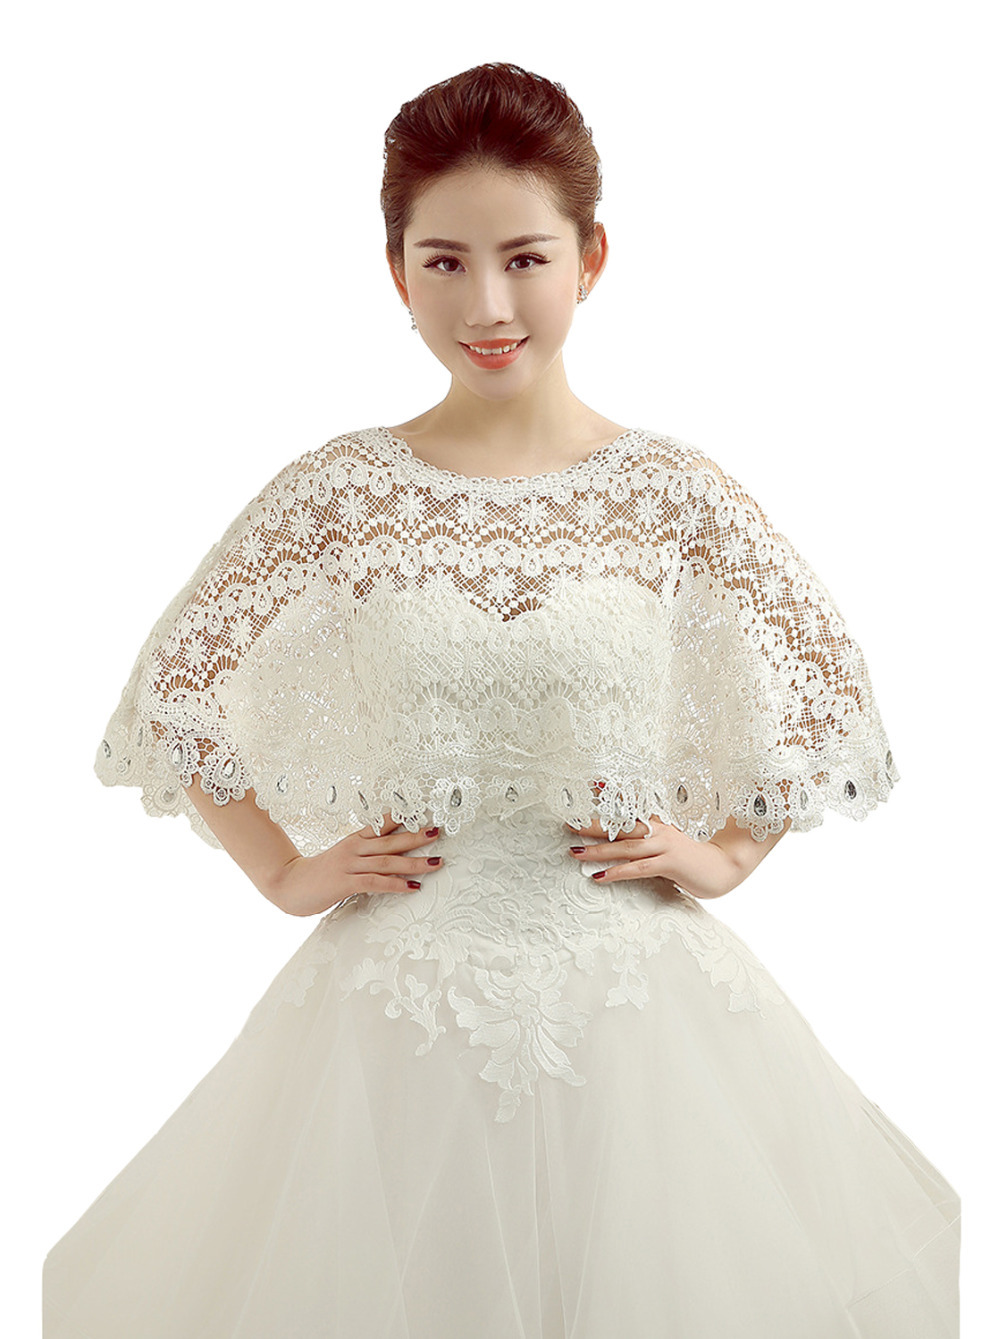 crocheted beige cream lace shrug crochet bridal shrug. Black Bedroom Furniture Sets. Home Design Ideas